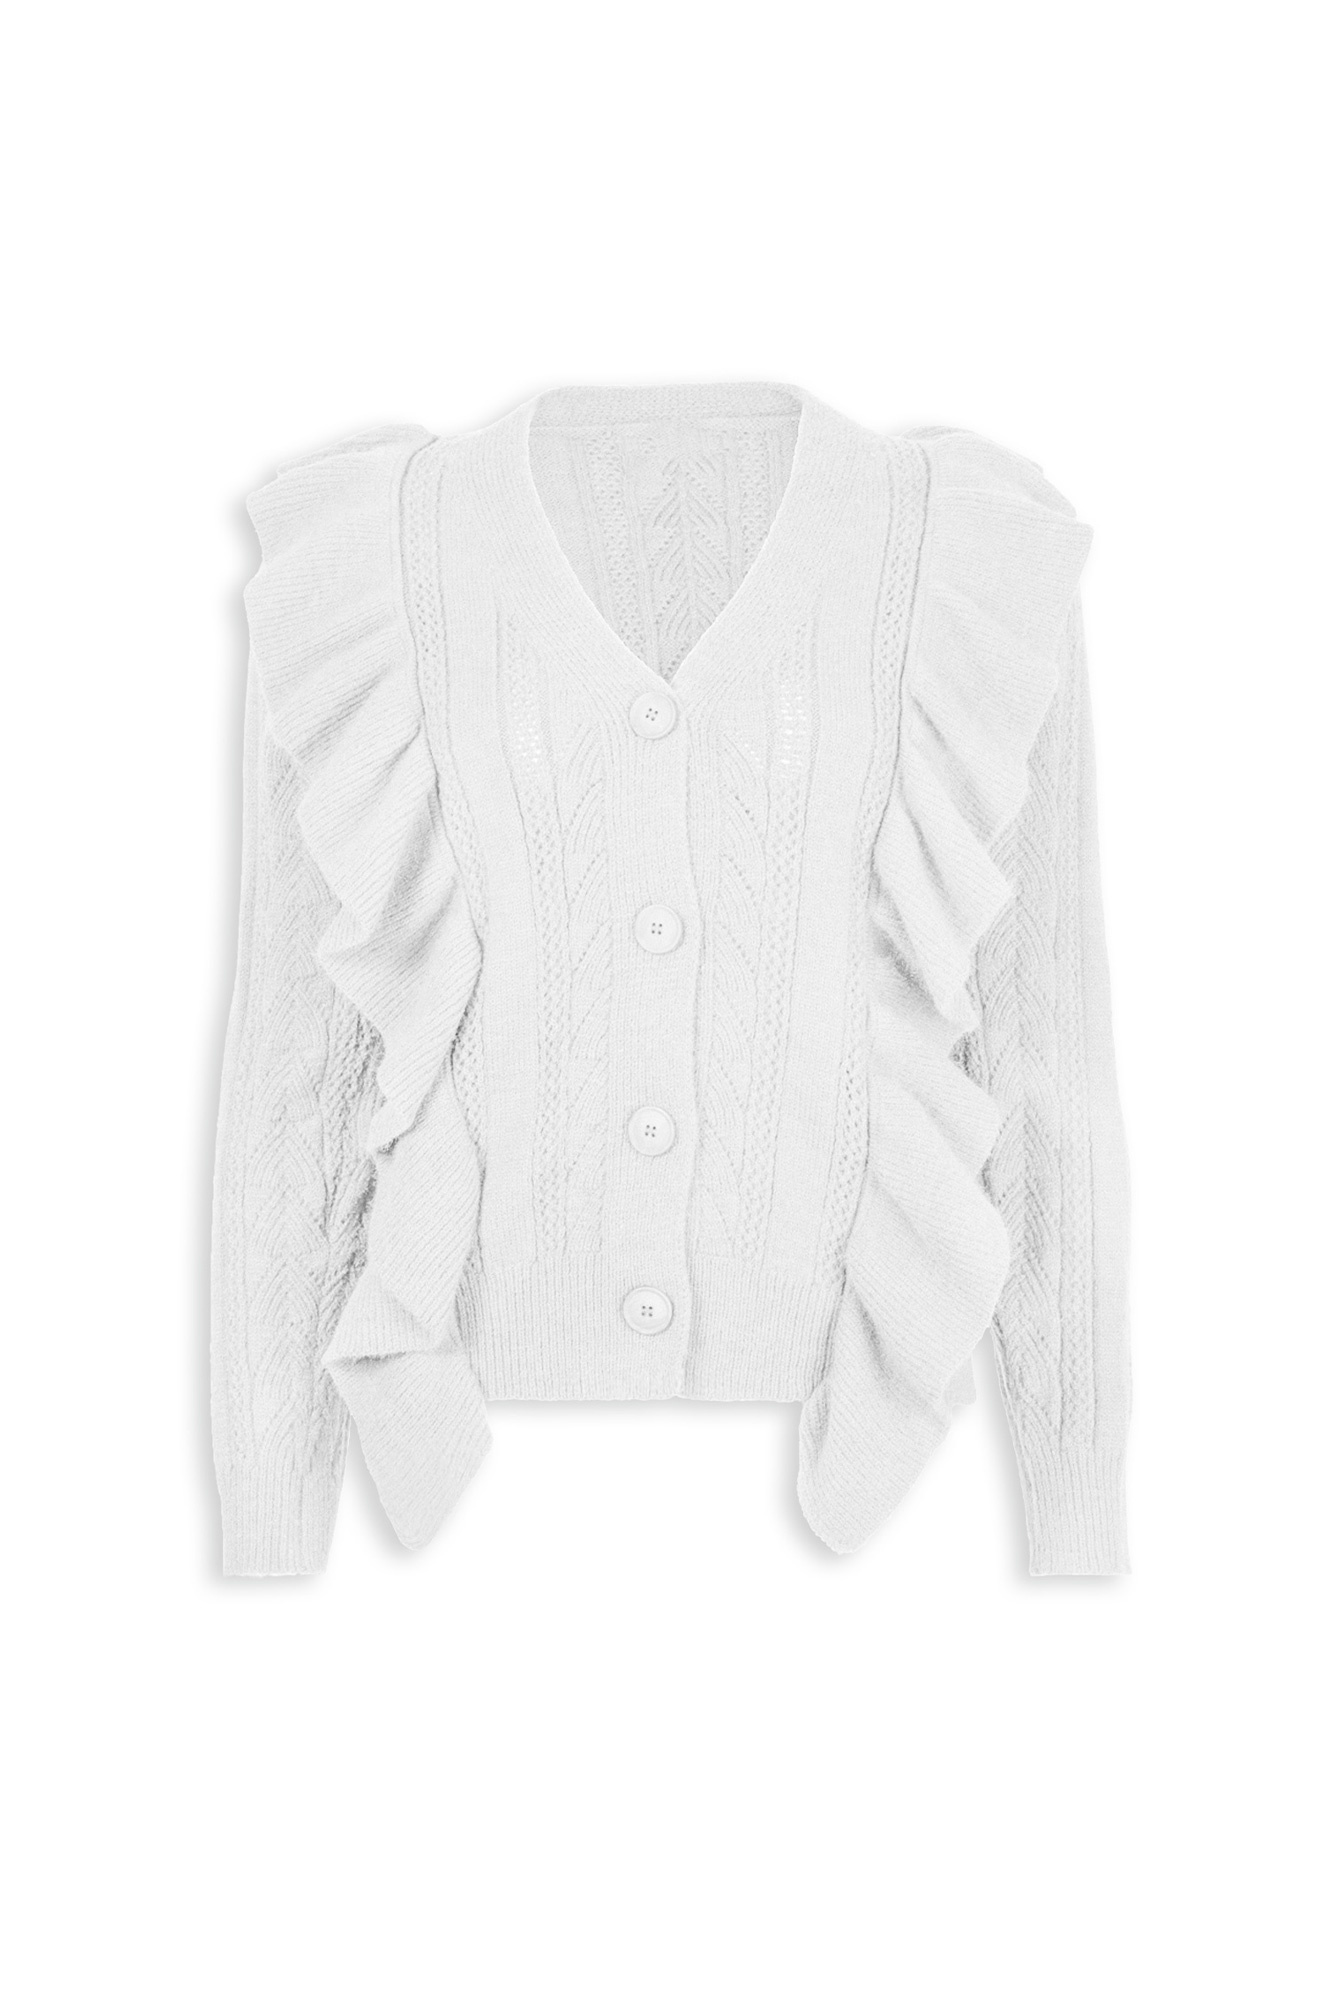 Button knit Dilara wit